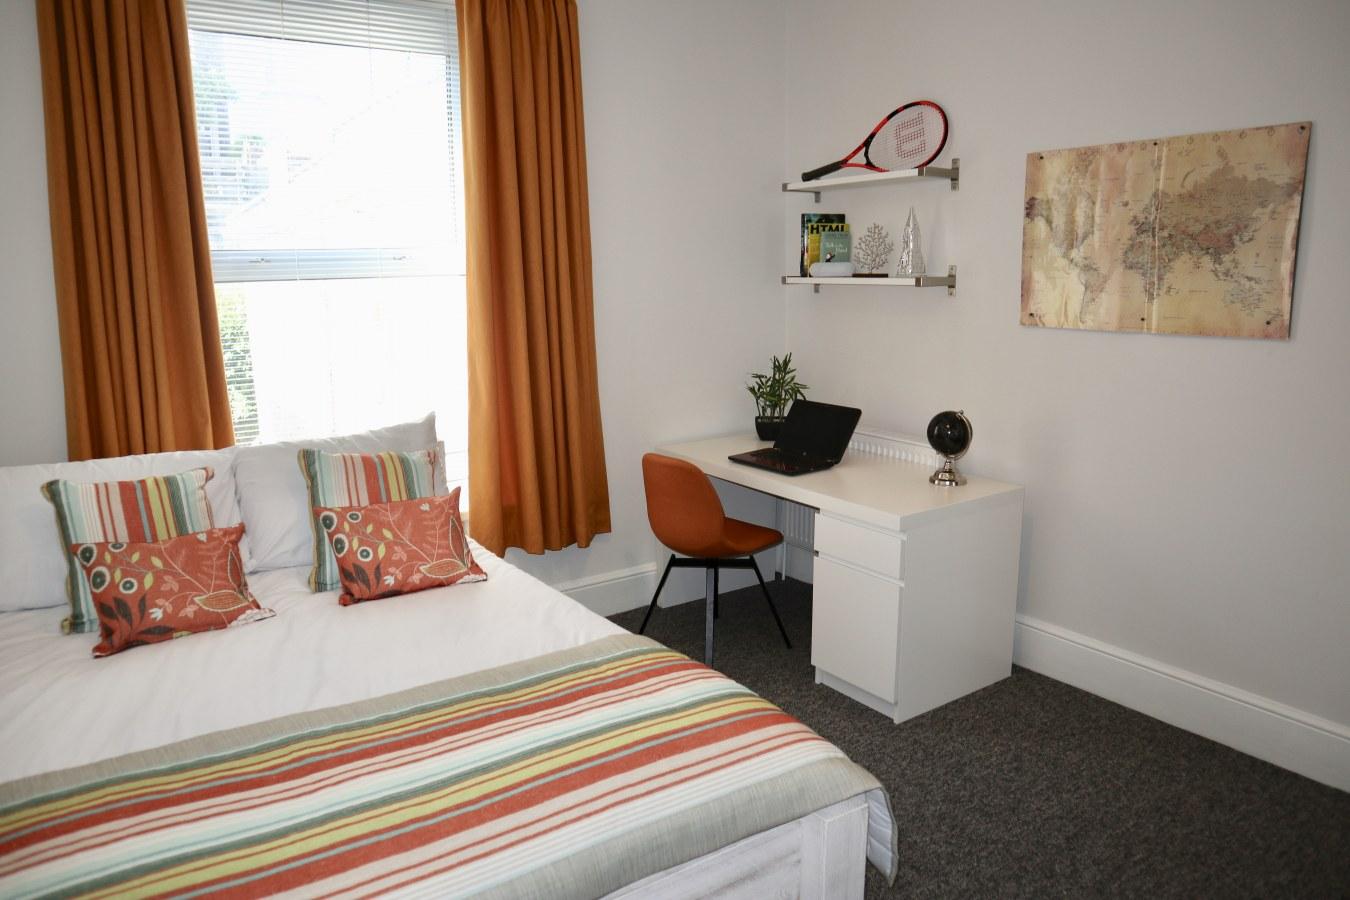 22 Bryn Road Swansea Student Accommodation Condor